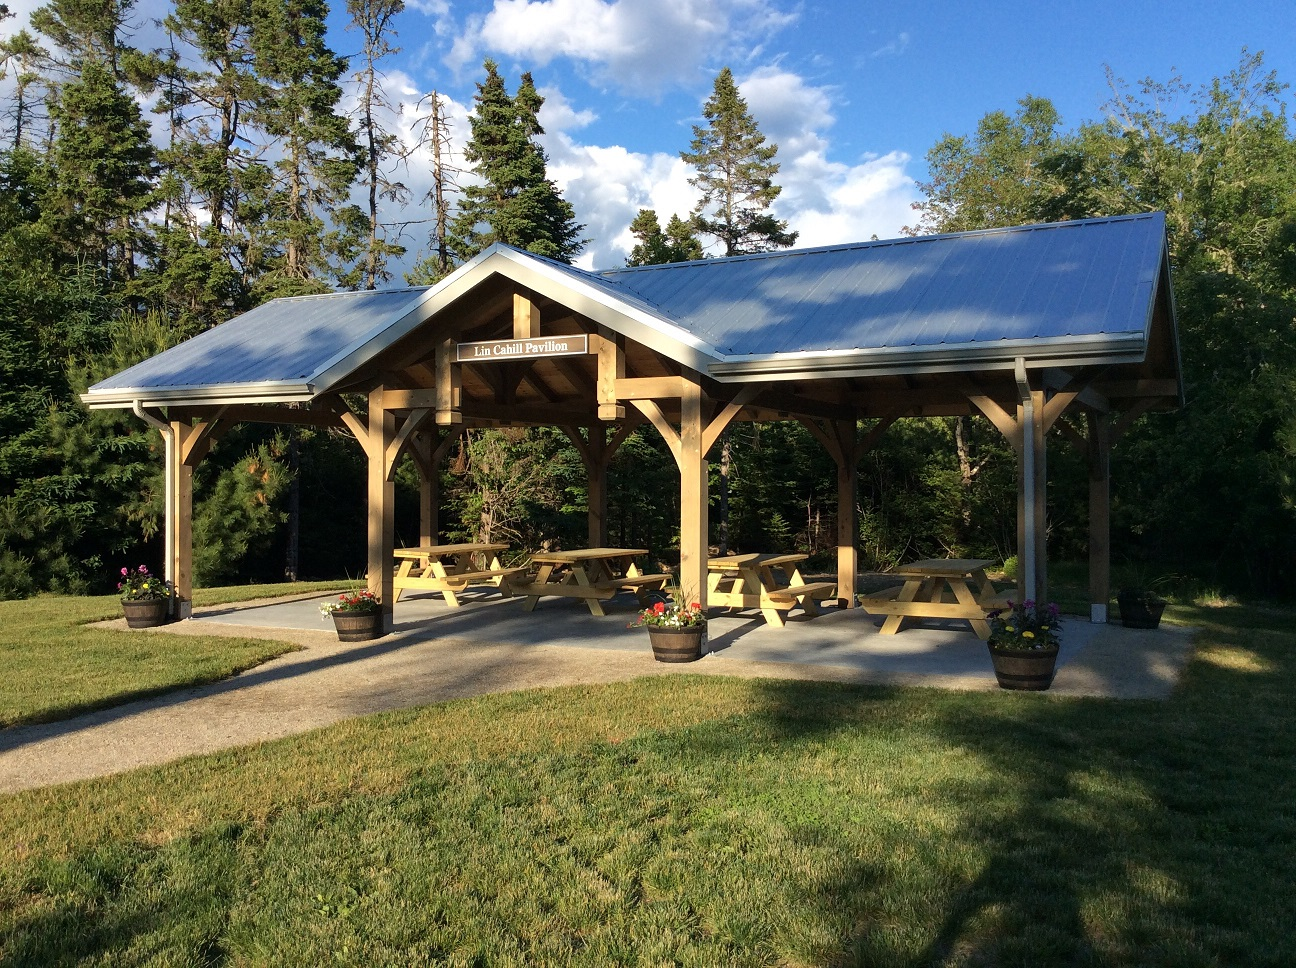 Lin Cahill Pavilion